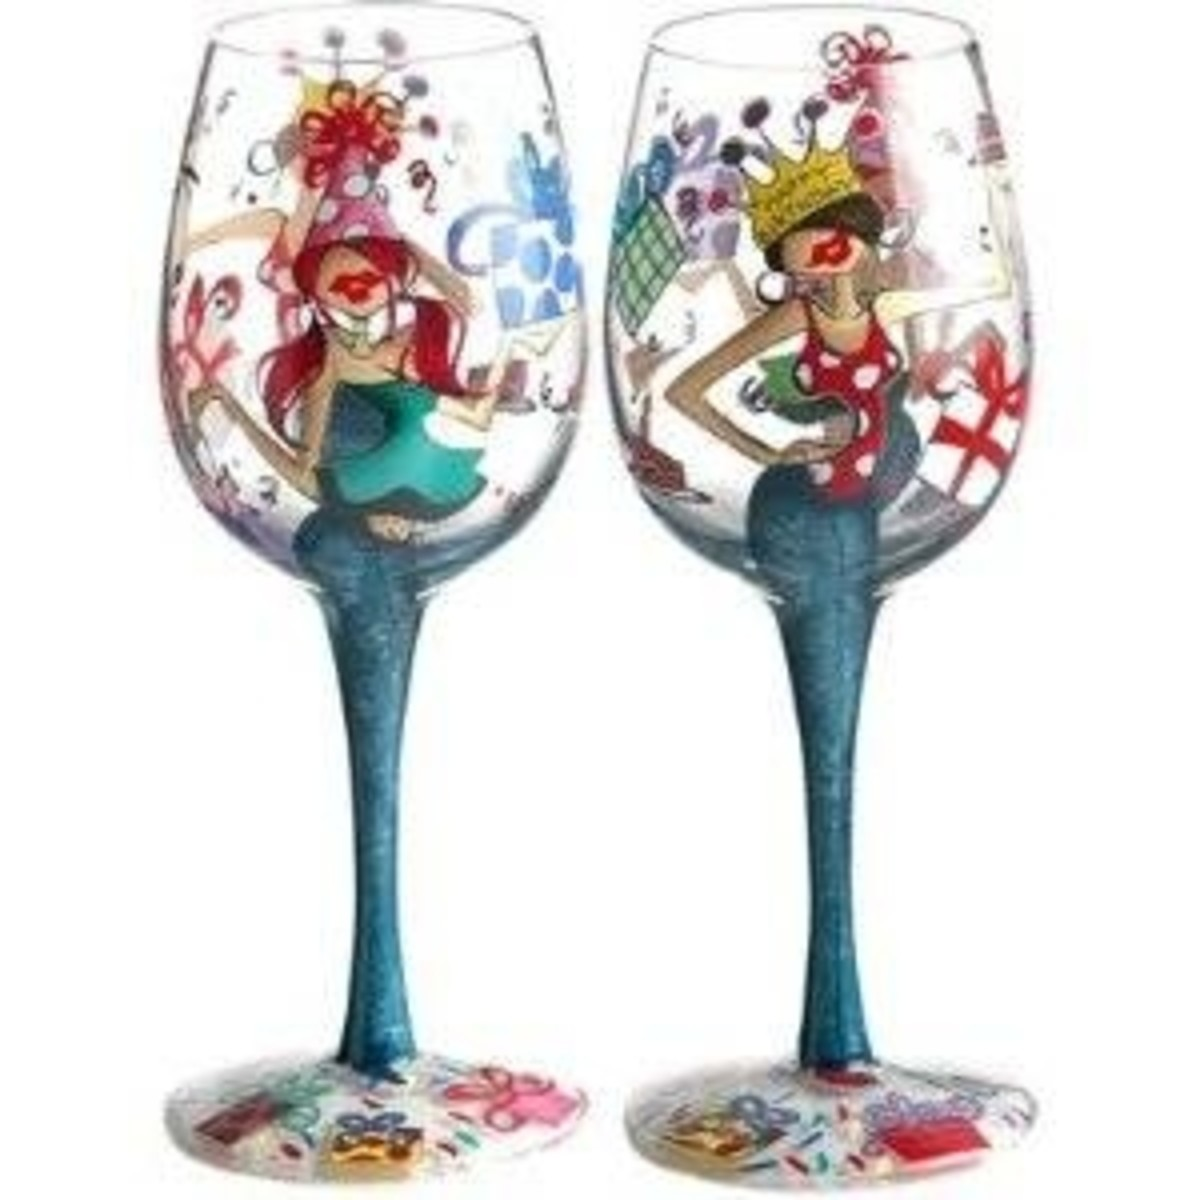 happy birthday handpainted decorative wine glasses